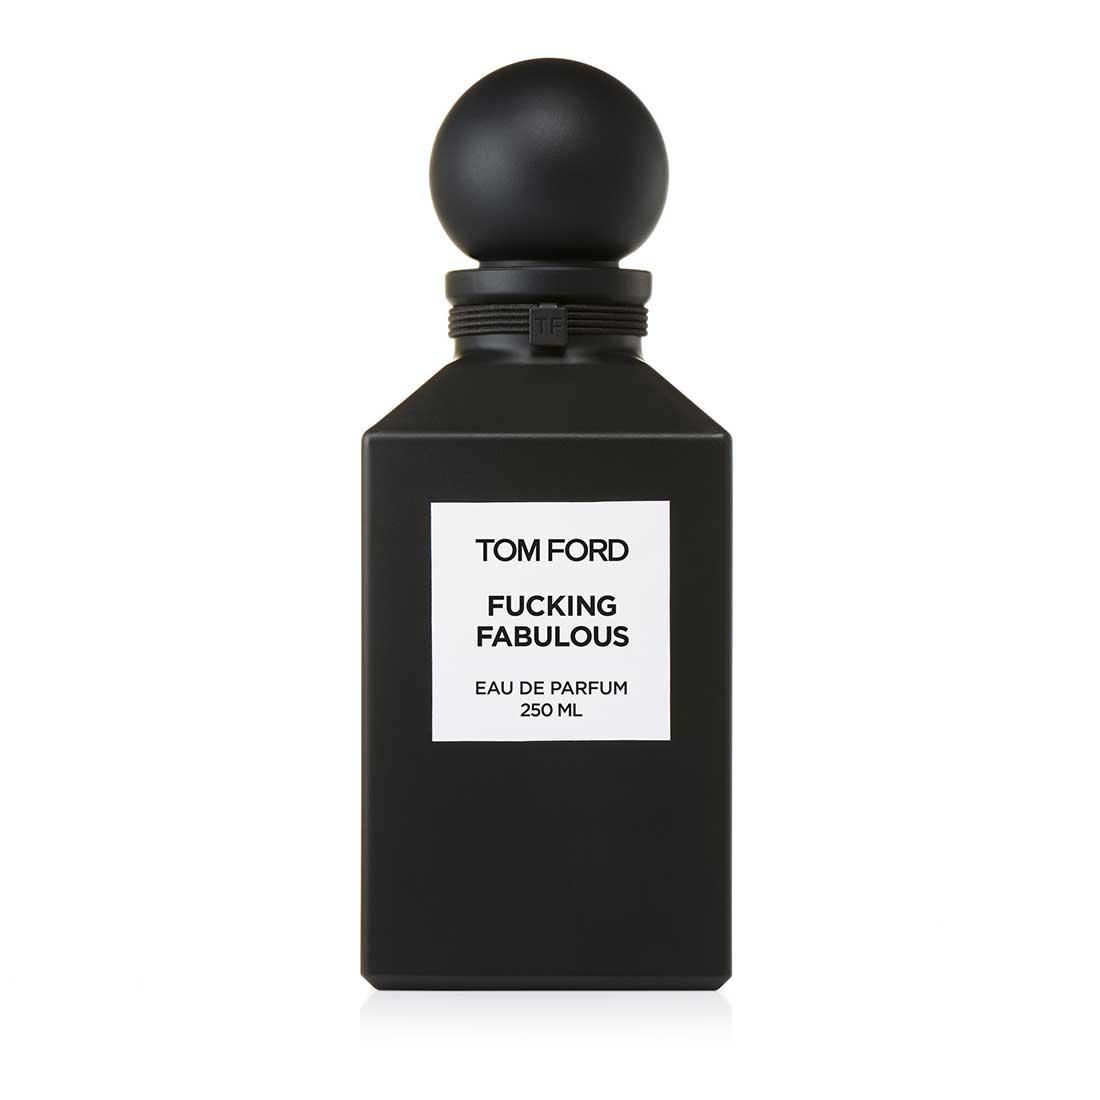 tom-ford-fucking-fabulous-perfume